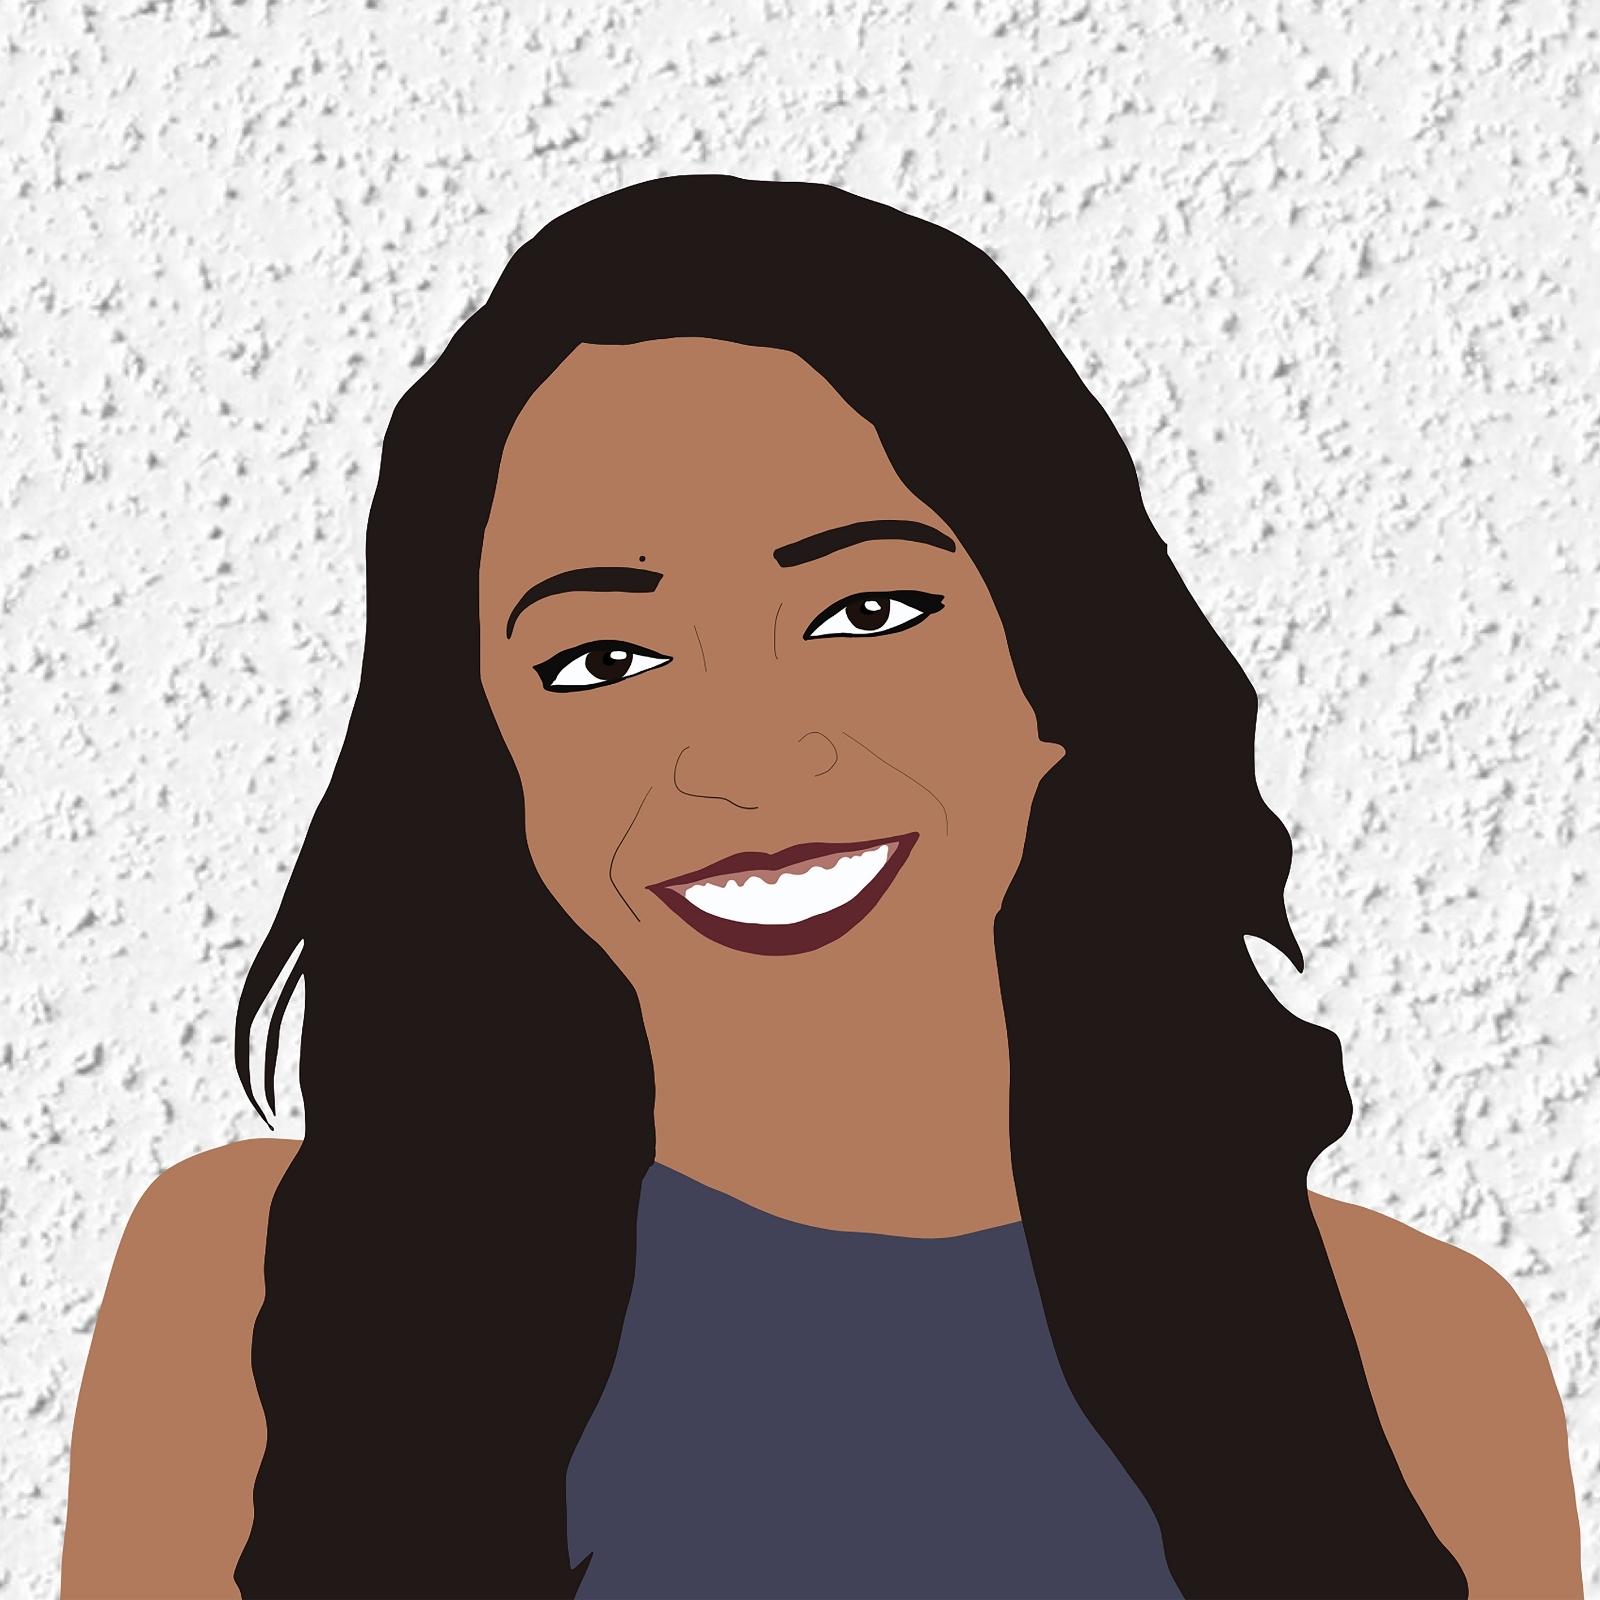 Digital illustration of Alana smiling against a white stucco background.